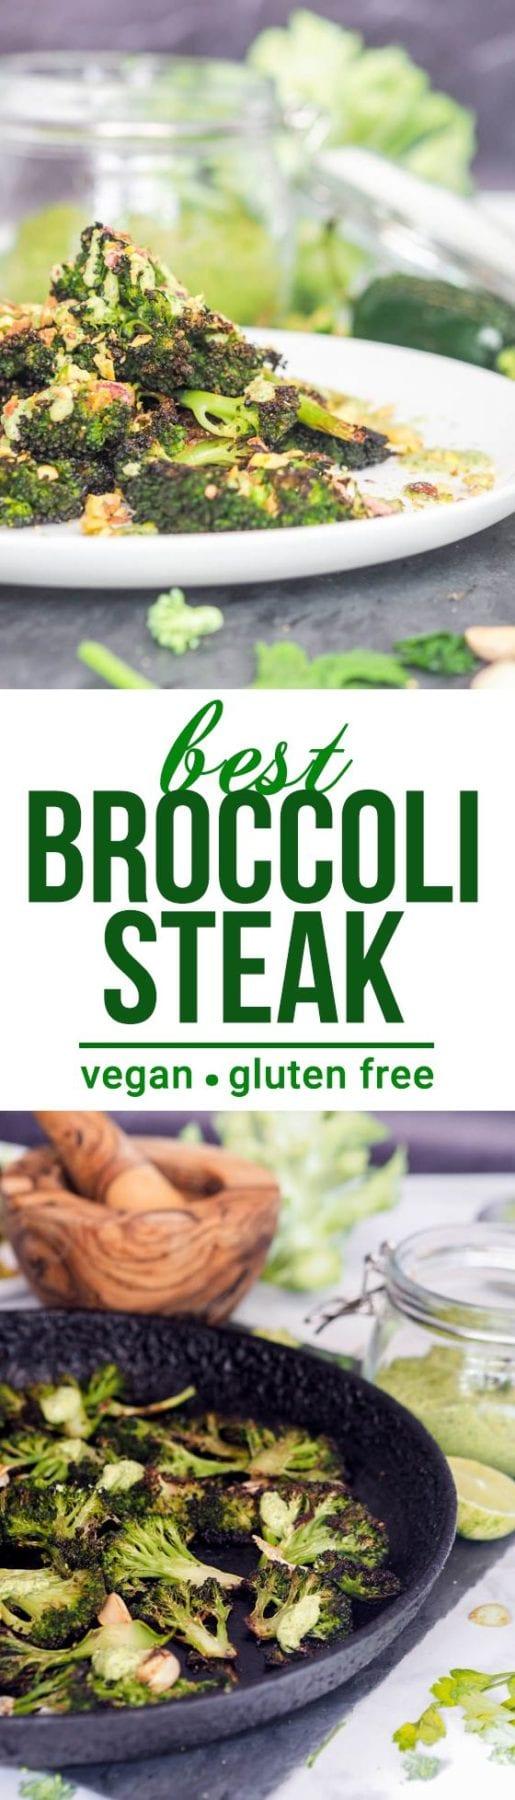 The best vegan vegetable side dish of all time - broccoli steak with cilantro jalapeno pistachio pesto. One of my all time favorite veggie recipes. Gluten Free too! #vegan #sidedish #glutenfree #healthy #broccoli